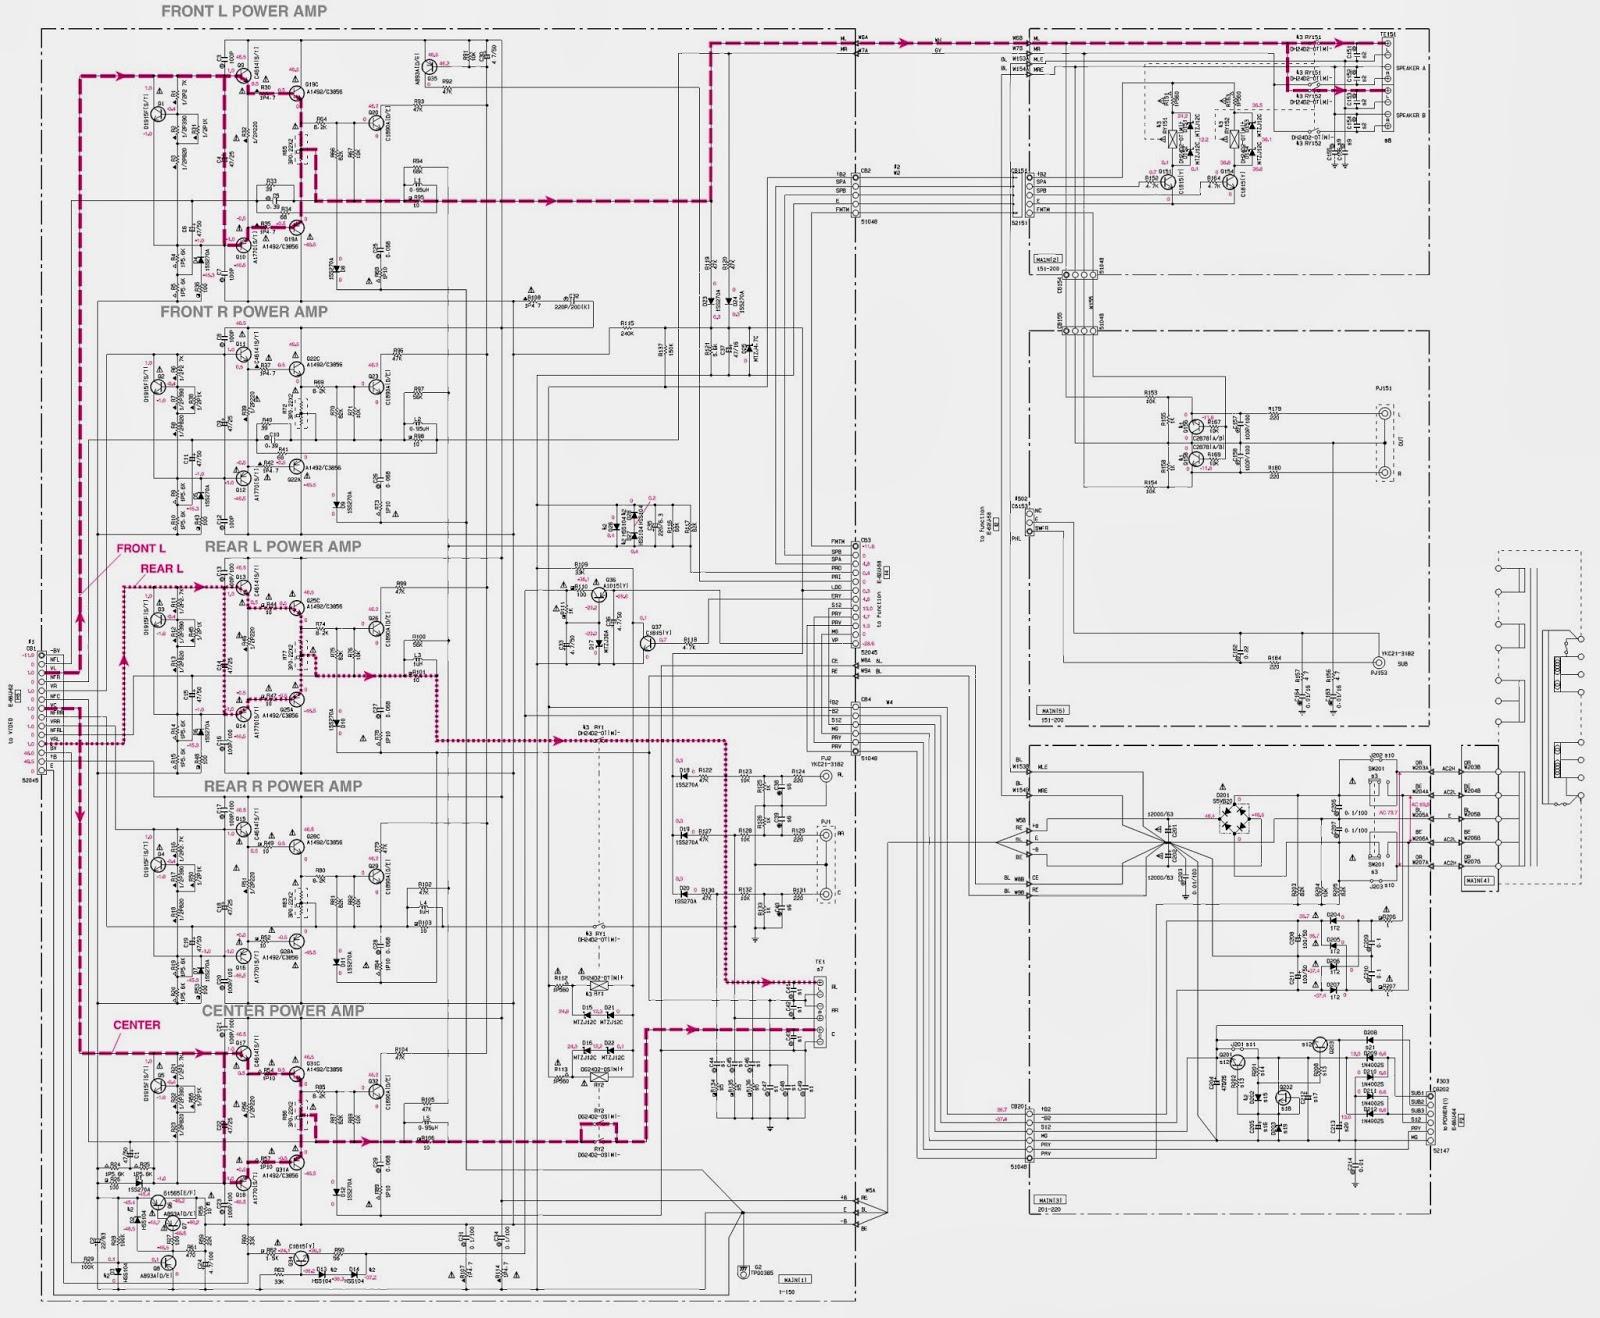 medium resolution of yamaha rx v800 rx v800rds htr 5280 u2013 av receiver power amp schematicamp schematic circuit diagram